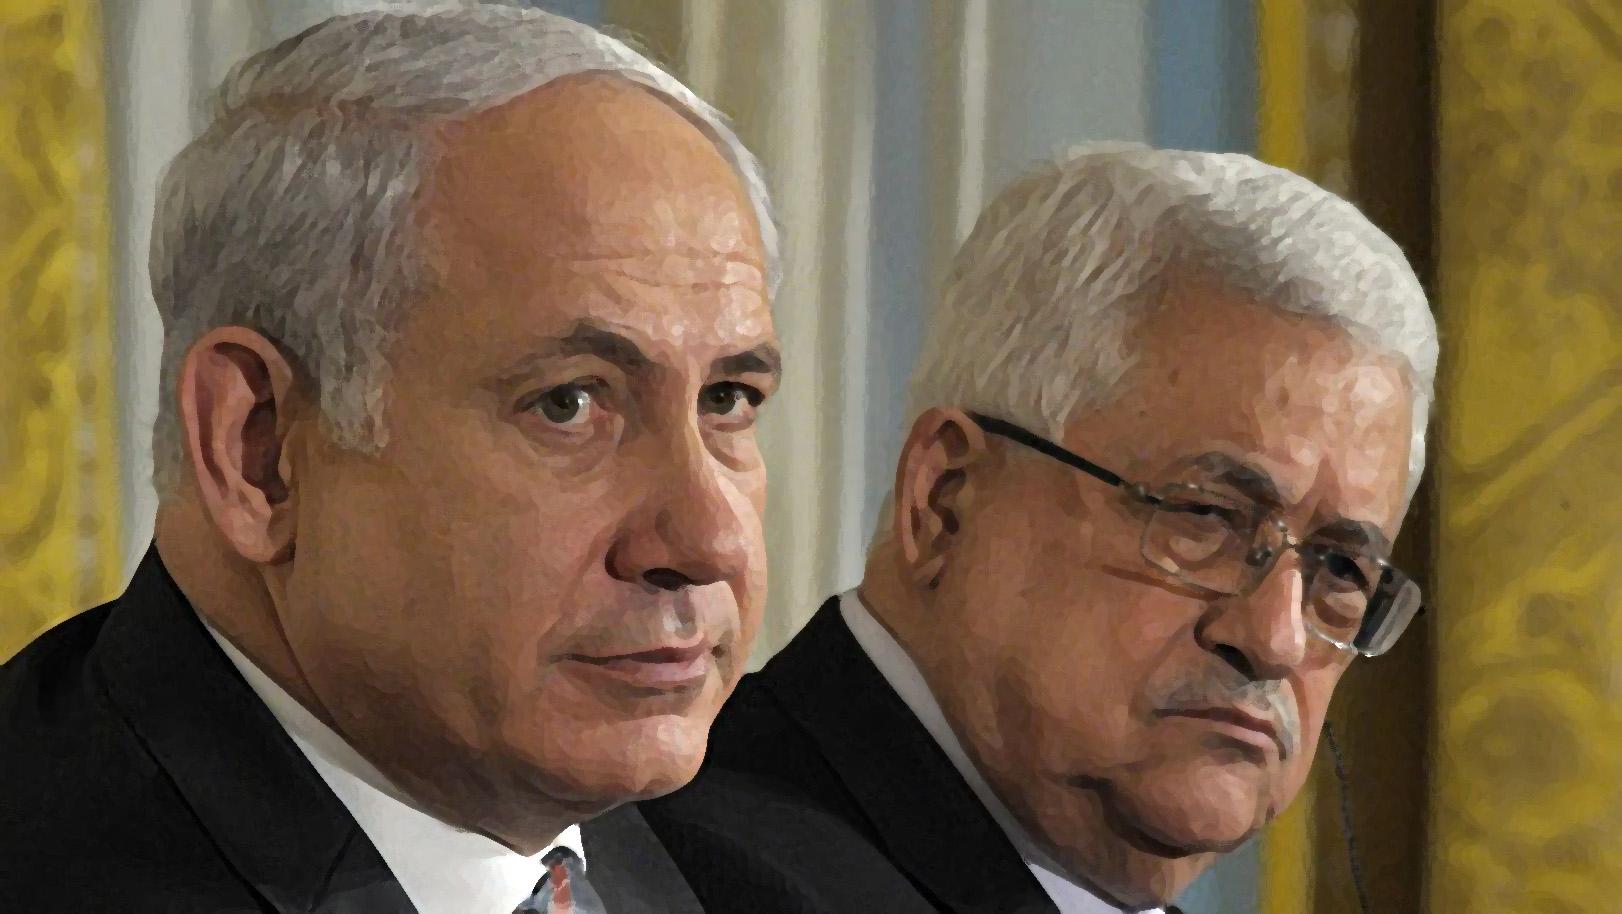 Il premier israeliano Netanyahu e il presidente palestinese Abu Mazen